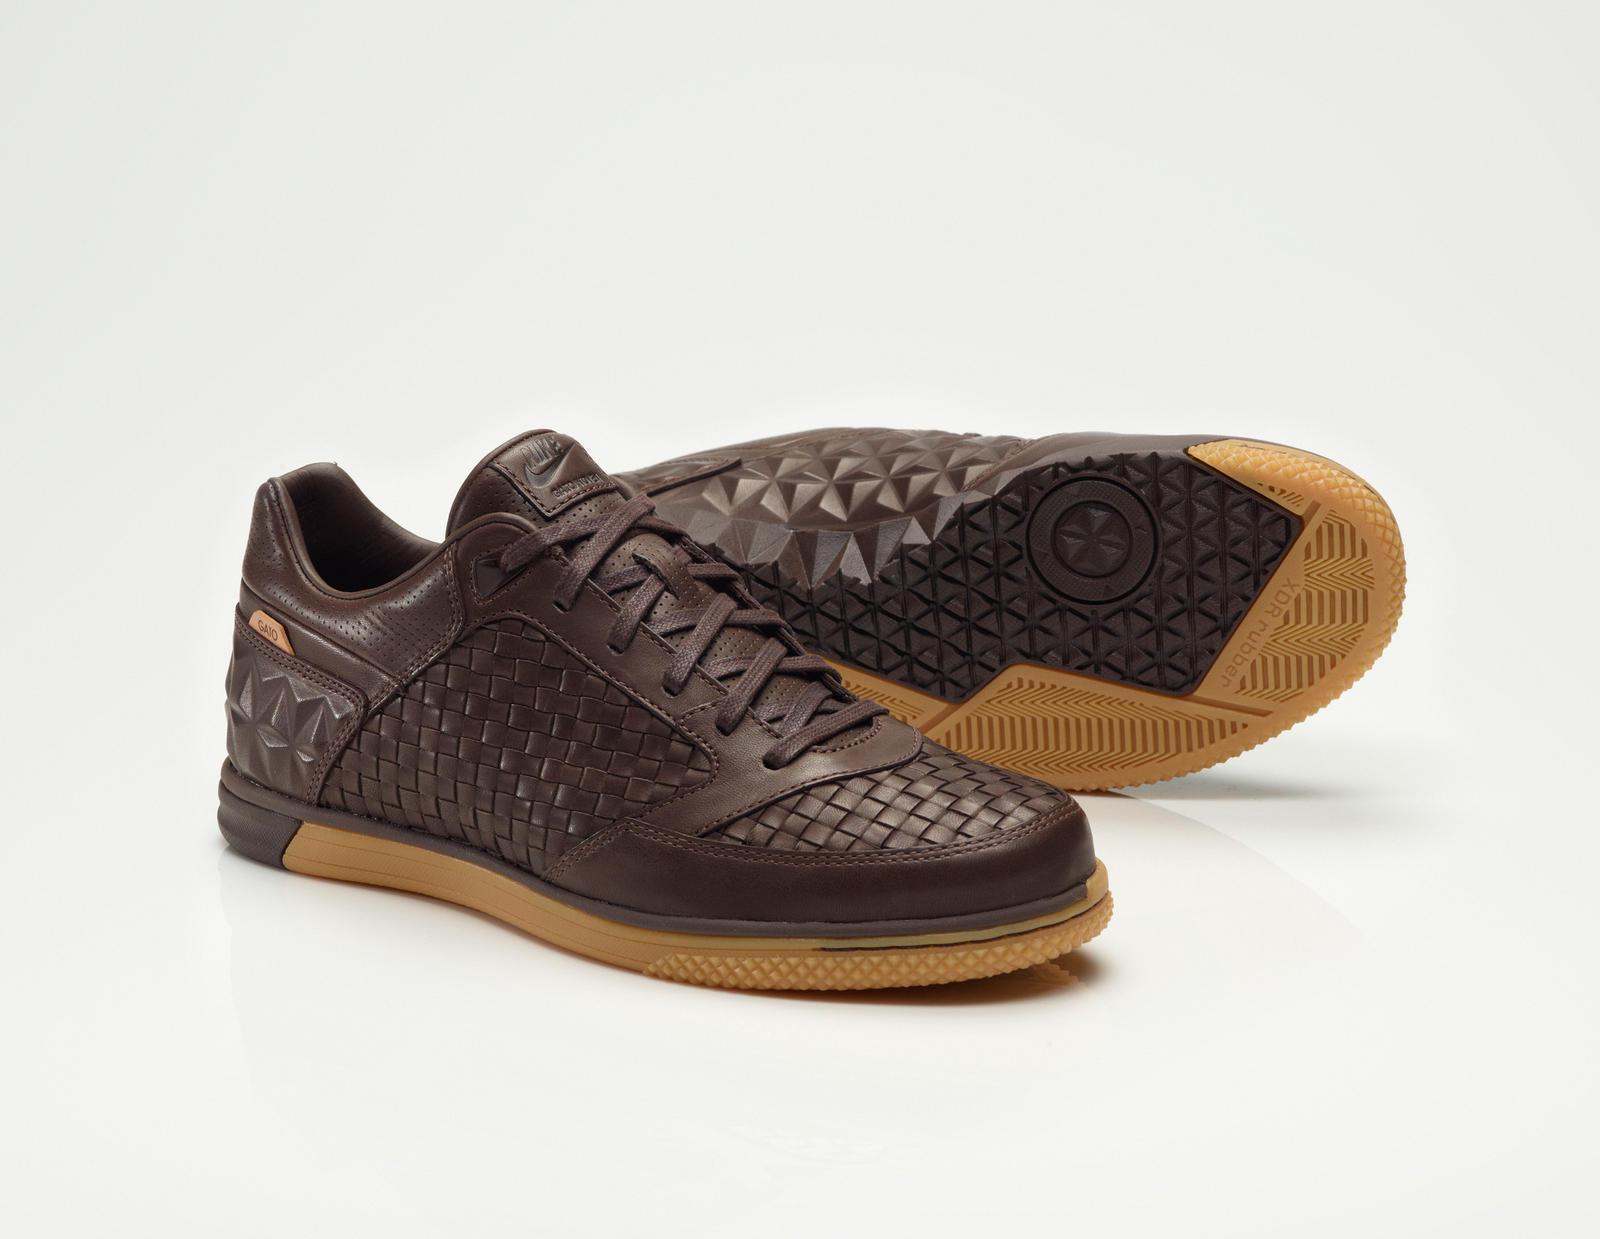 Nike Woven Running Shoes